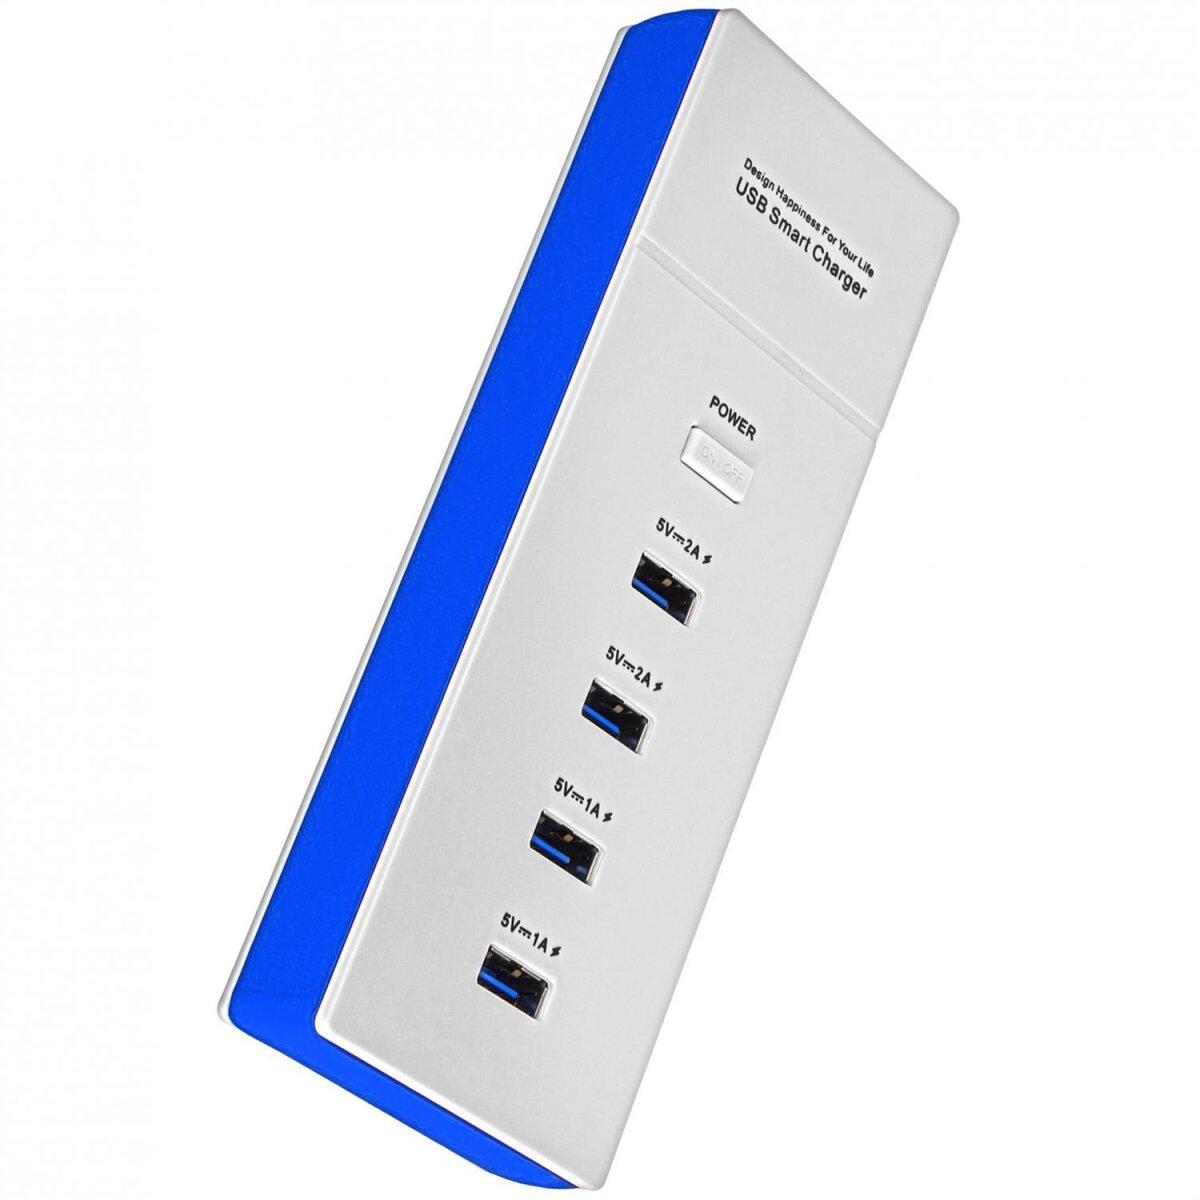 Minadax universelles 5 Volt 4,2 Ampere 4-Port USB Ladegeraet Leiste fuer Smartphone, Tablet PC etc in ruhigem Blau